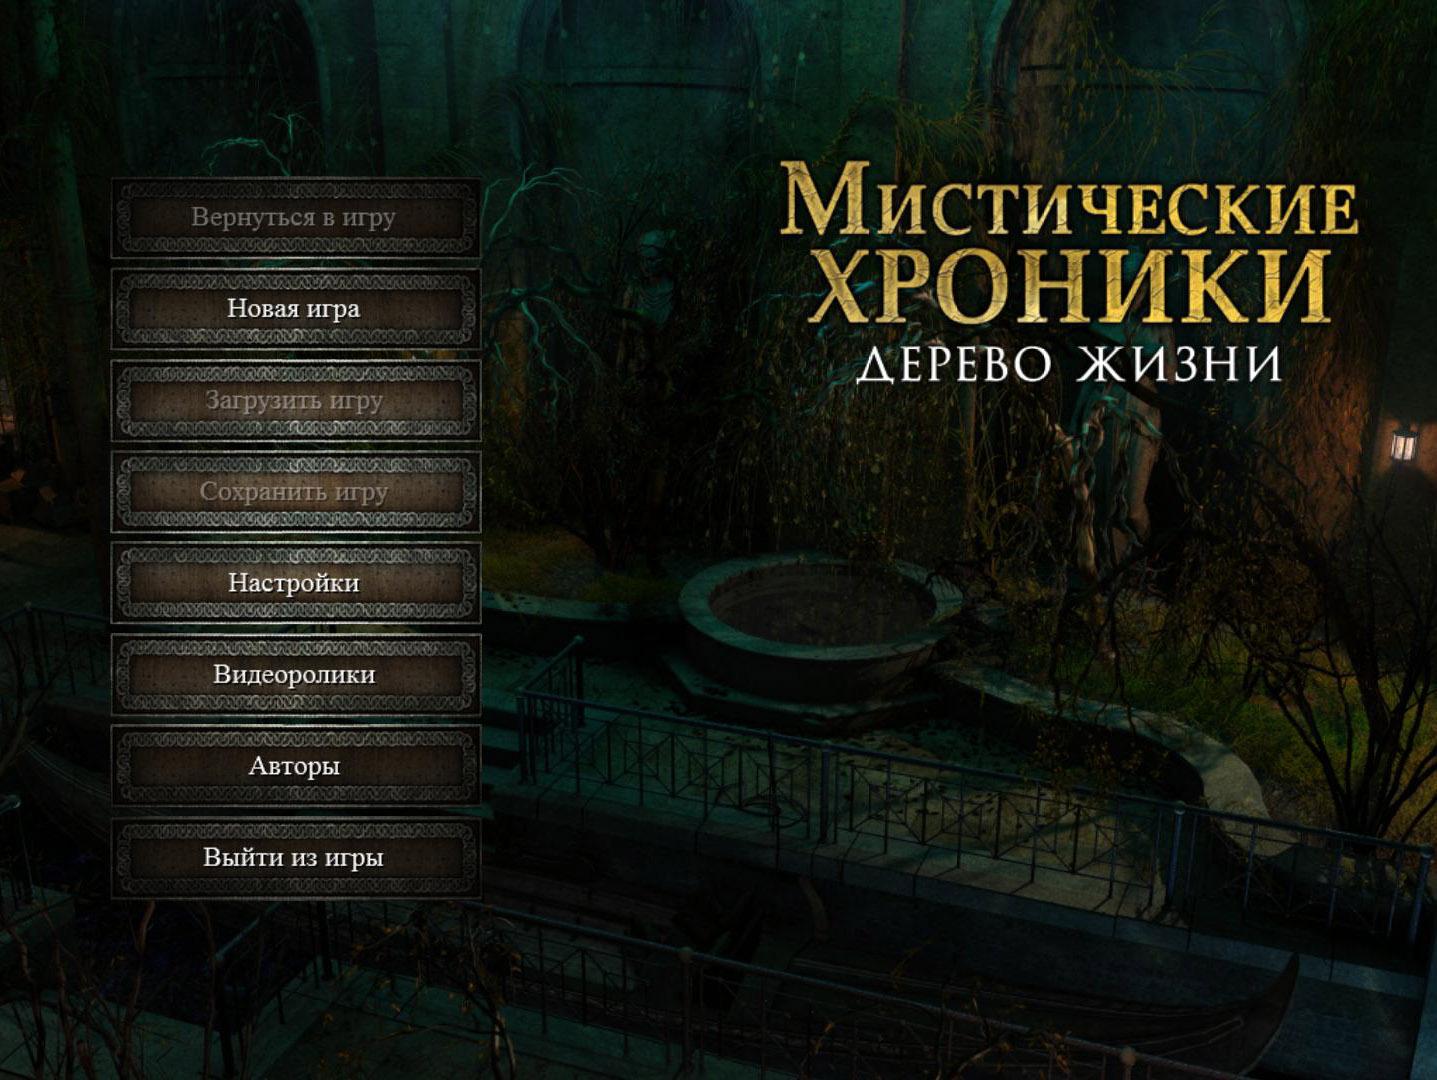 Мистические хроники 2: Дерево жизни   Chronicles of Mystery 2: The Tree of Life (Rus)